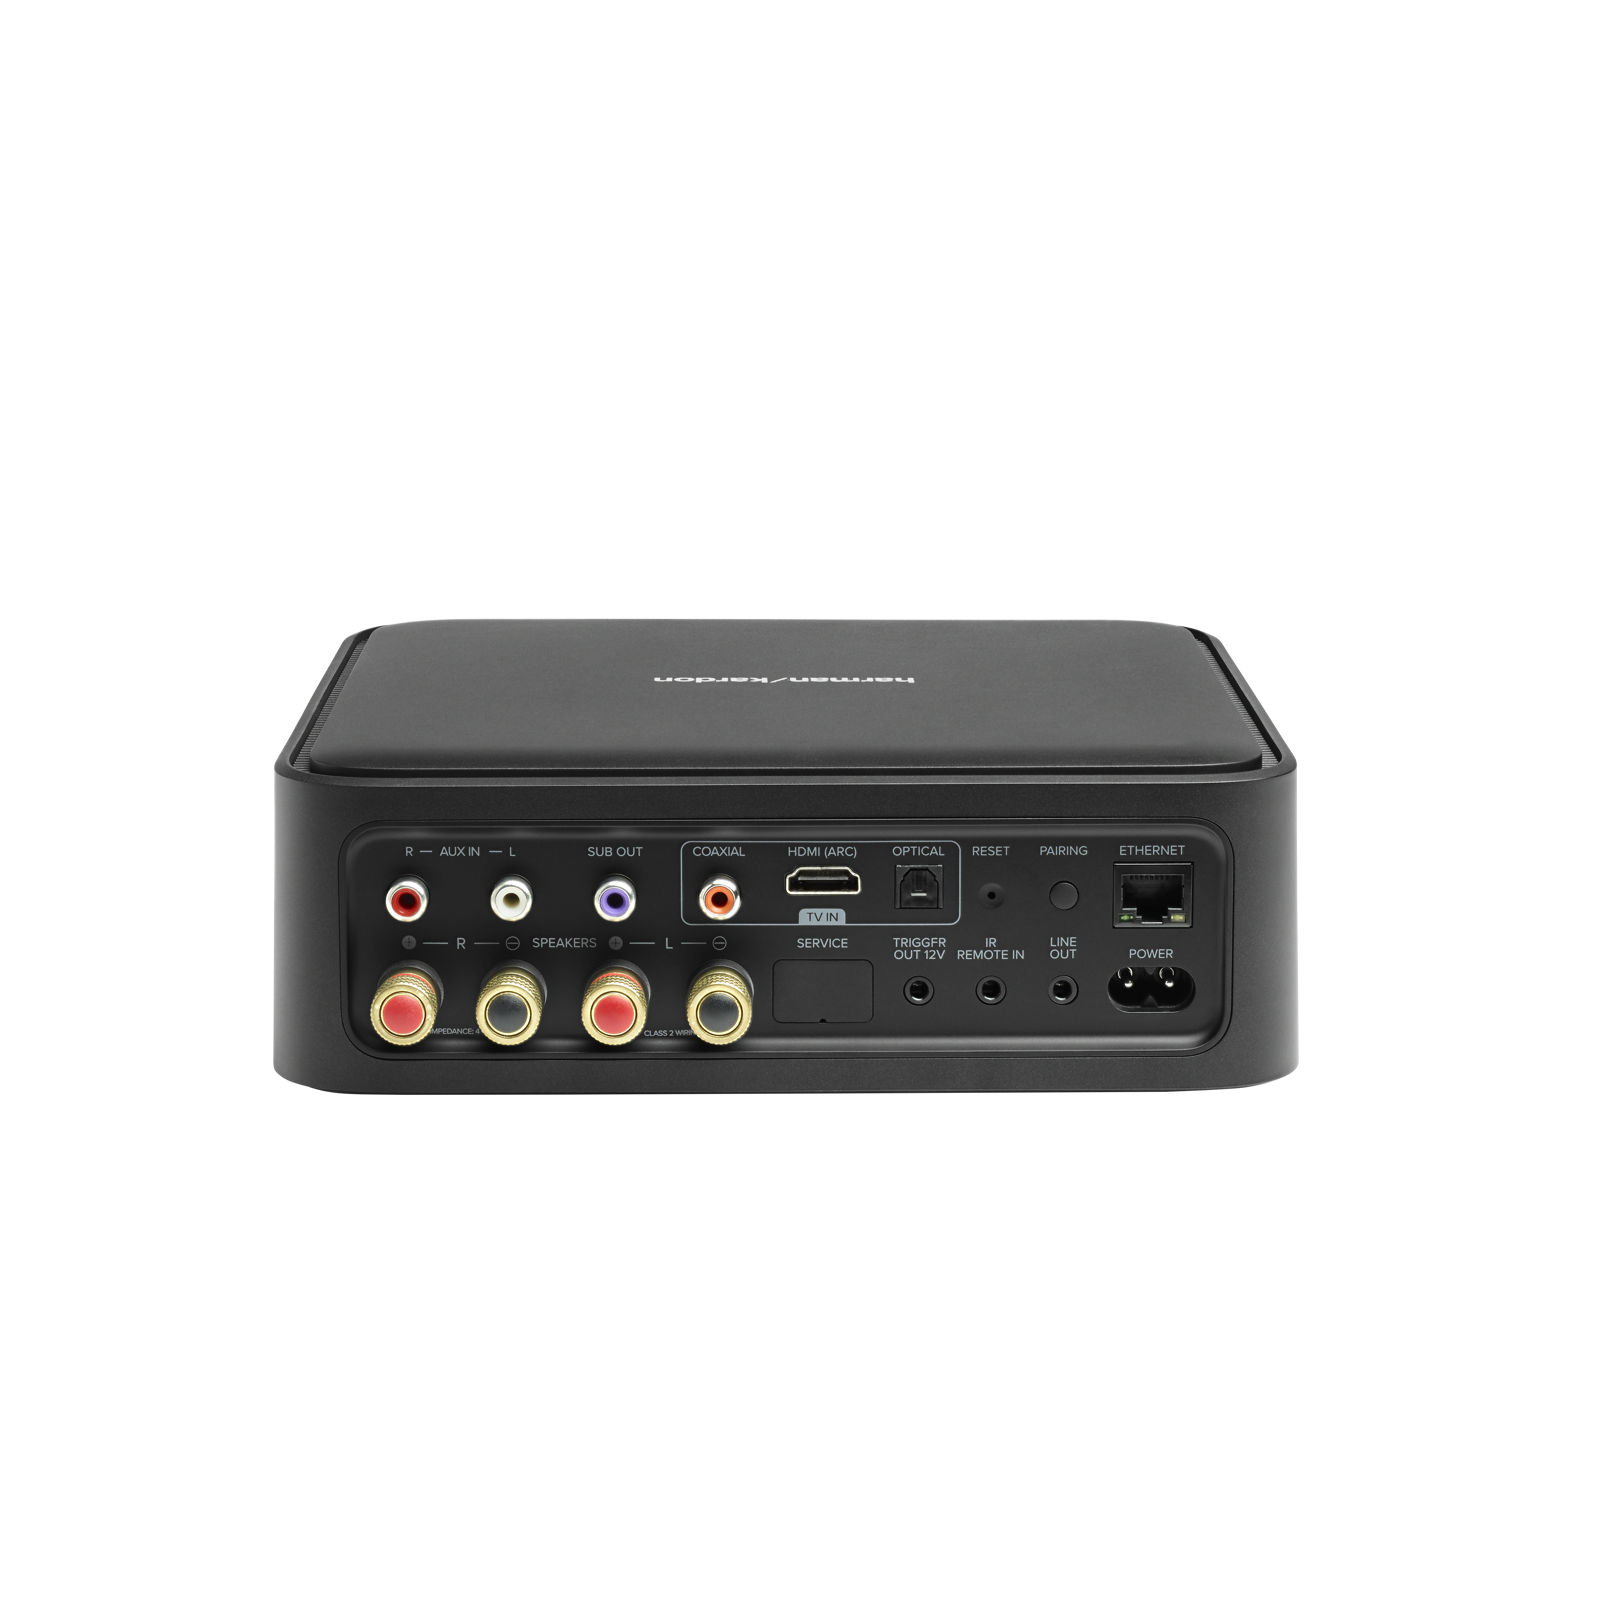 Harman Kardon Citation Amp - Black - High-power, wireless streaming stereo amplifier - Back